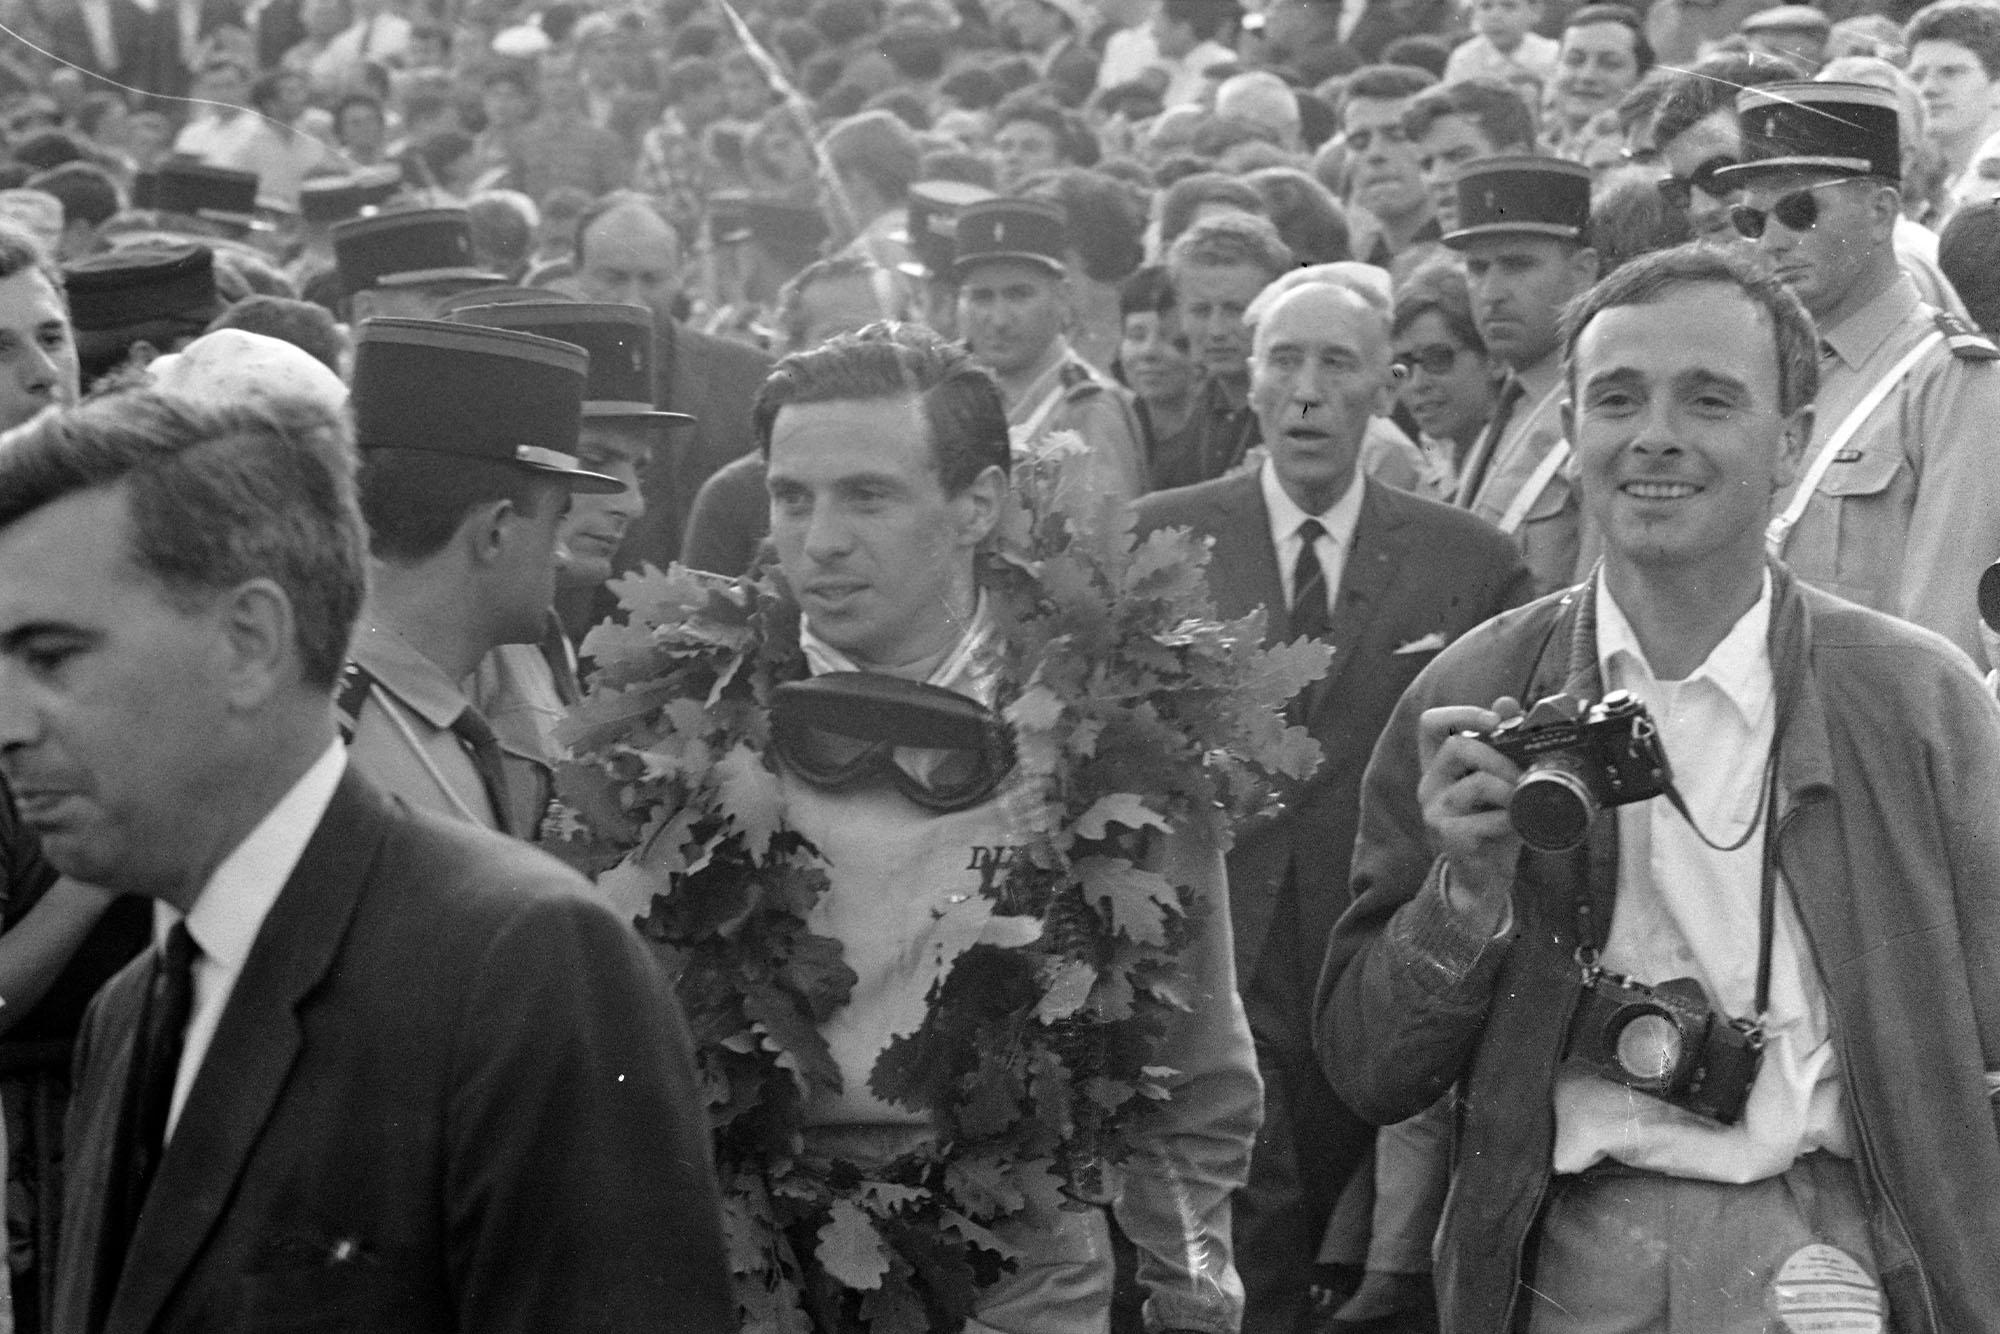 Jim Clark, 1st position, with his race winner's wreath.